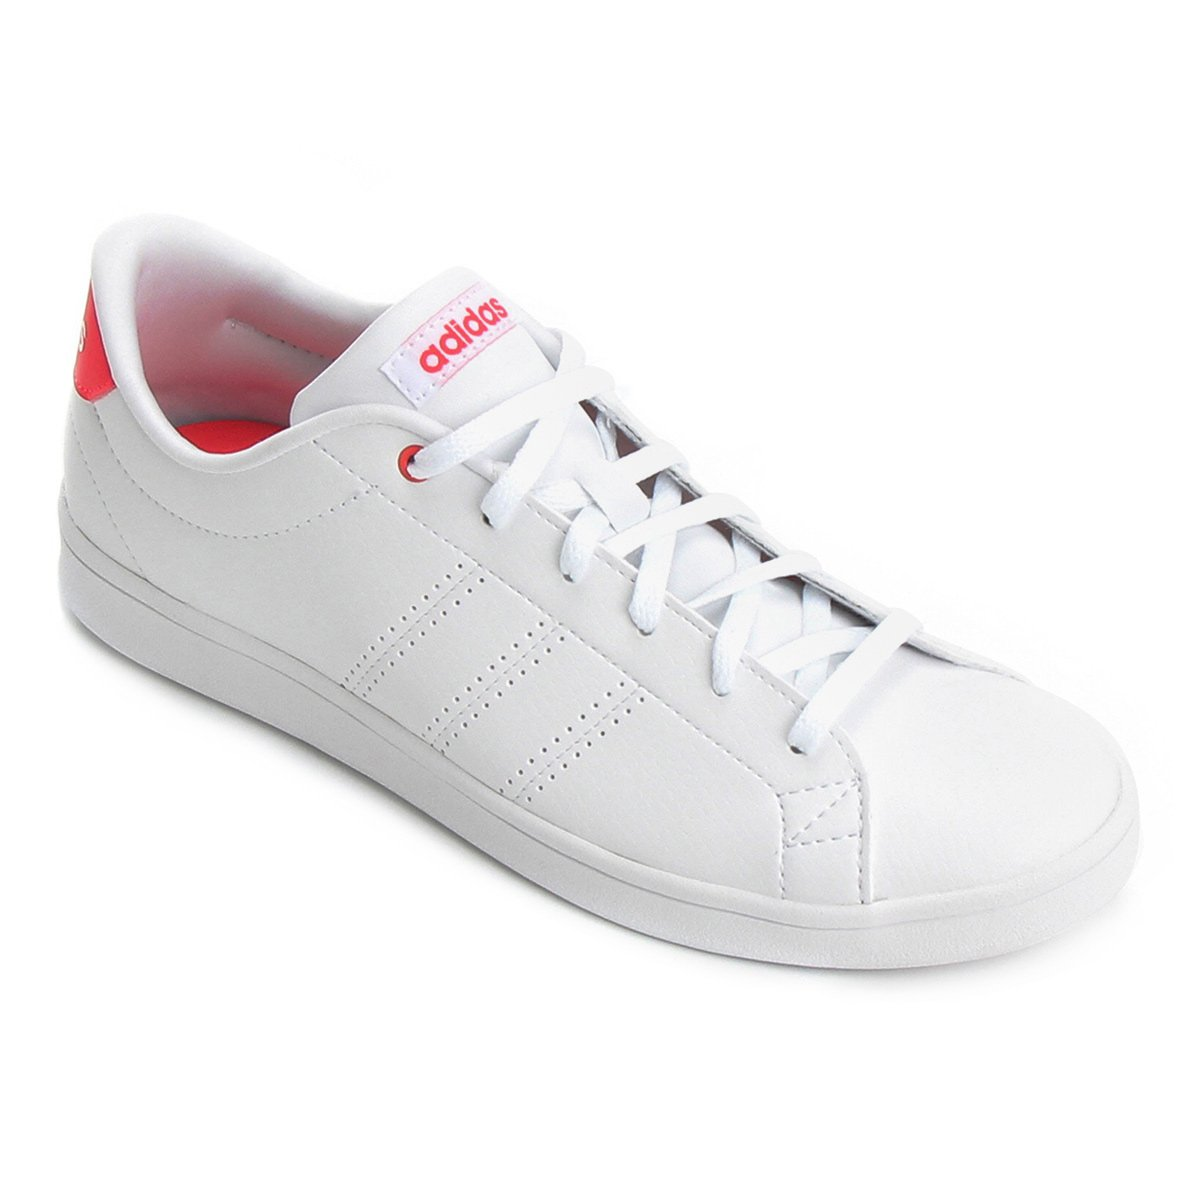 b9b34afeae2 Tênis Adidas Advantage Clean Qt Feminino - Branco e Pink - Compre Agora